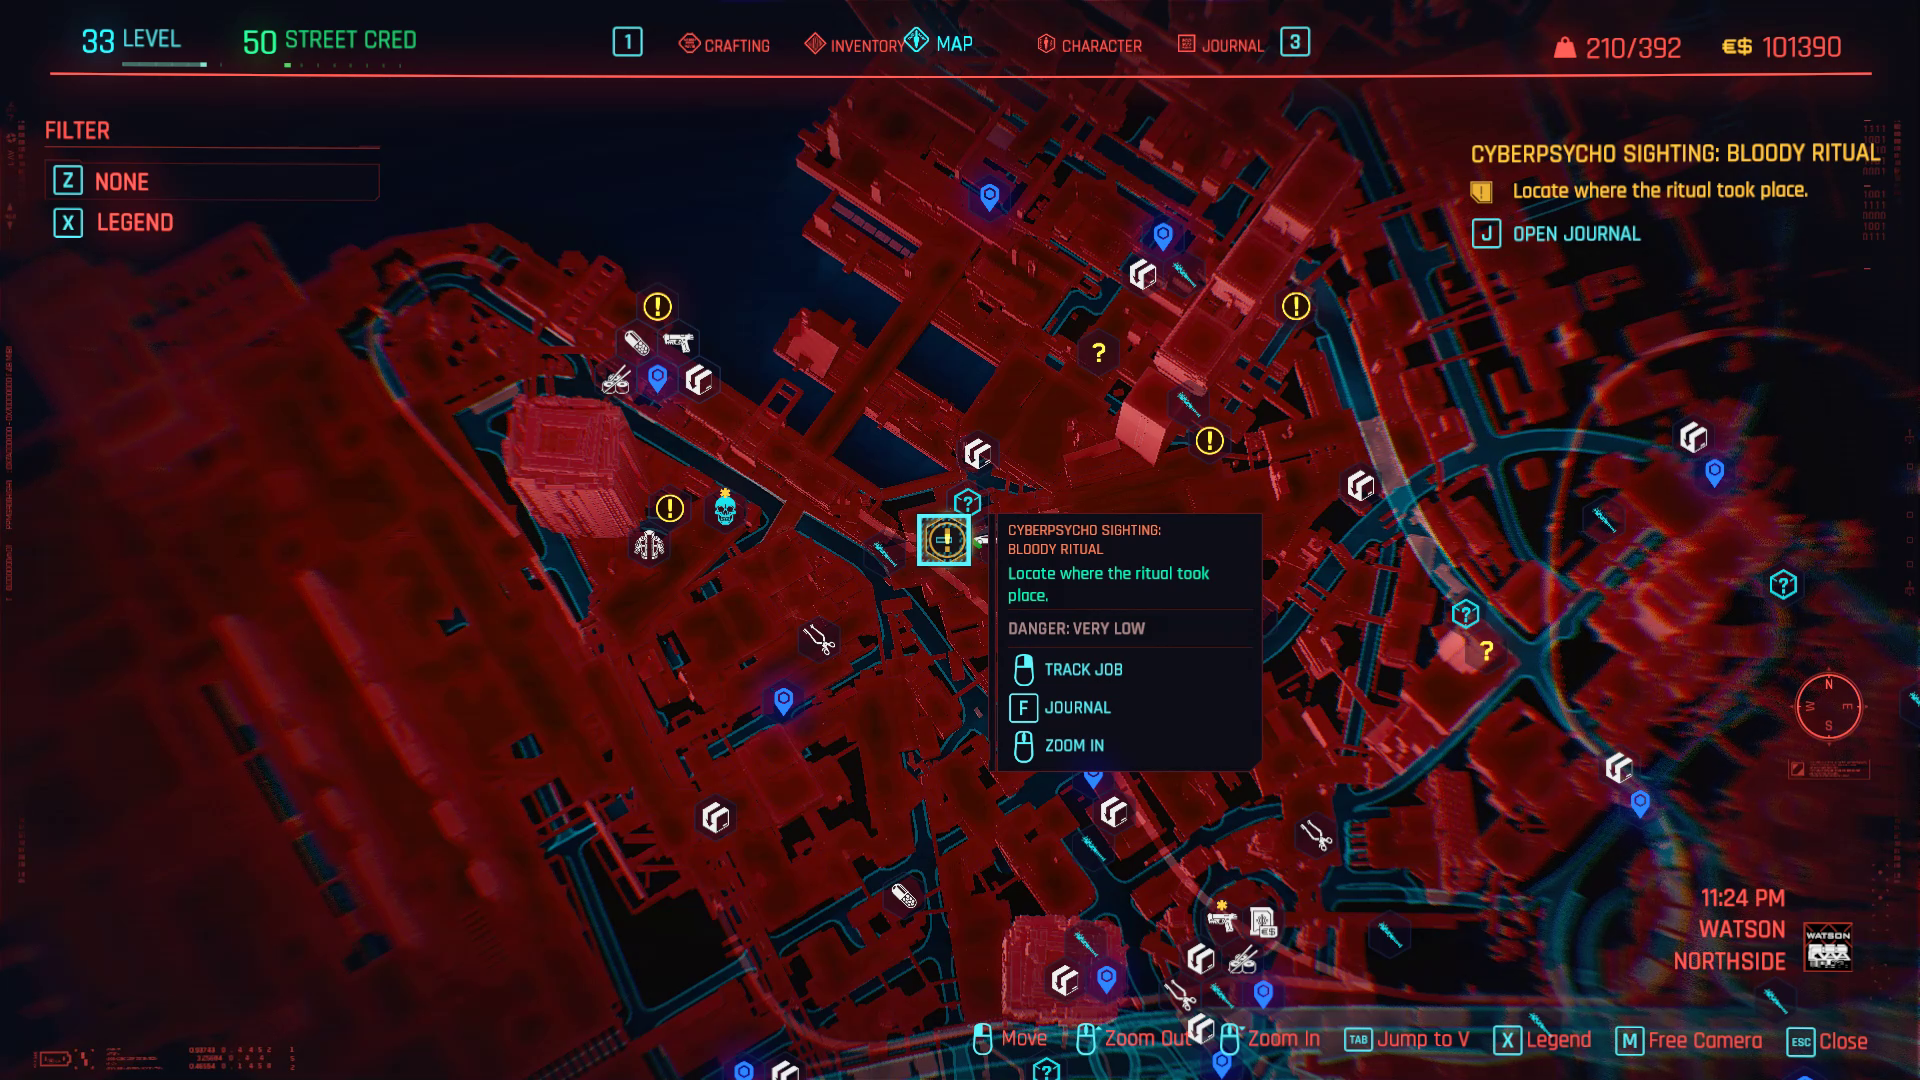 Cyberpsycho Bloody Ritual Zoom avant